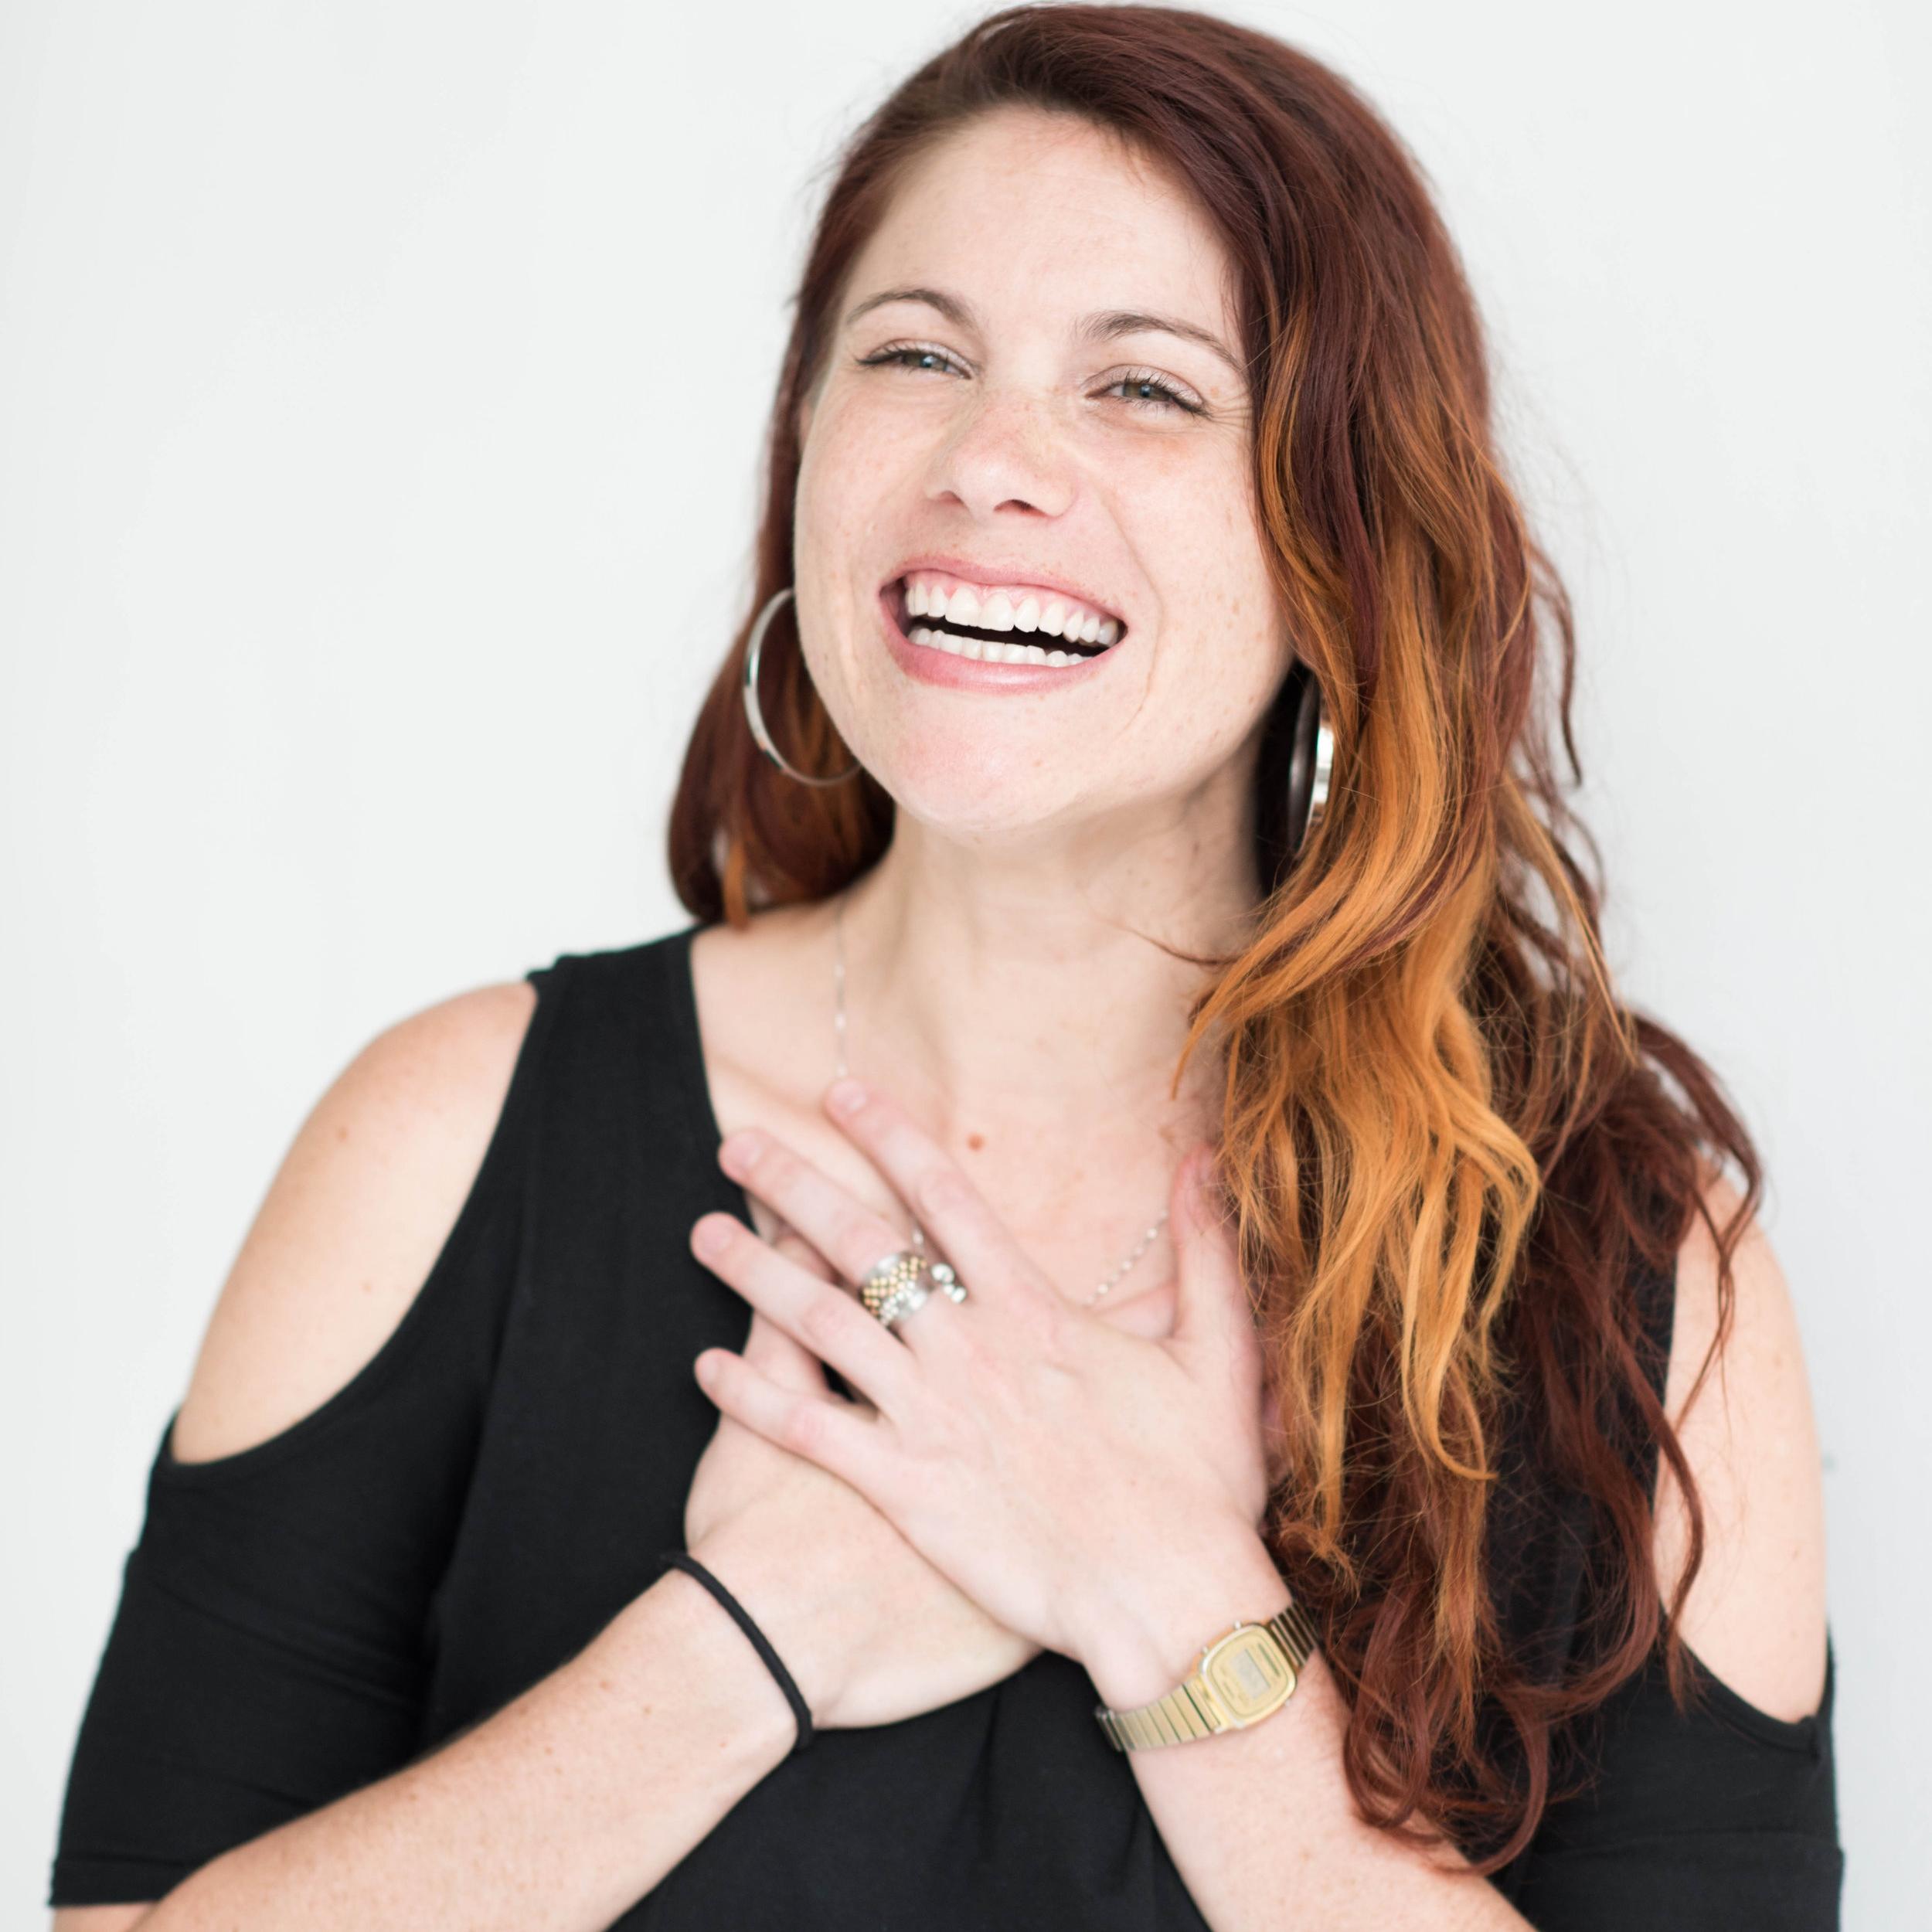 *Jessica M. Thompson - (The Light of the Moon, SXSW 2017 Audience Award Winner)